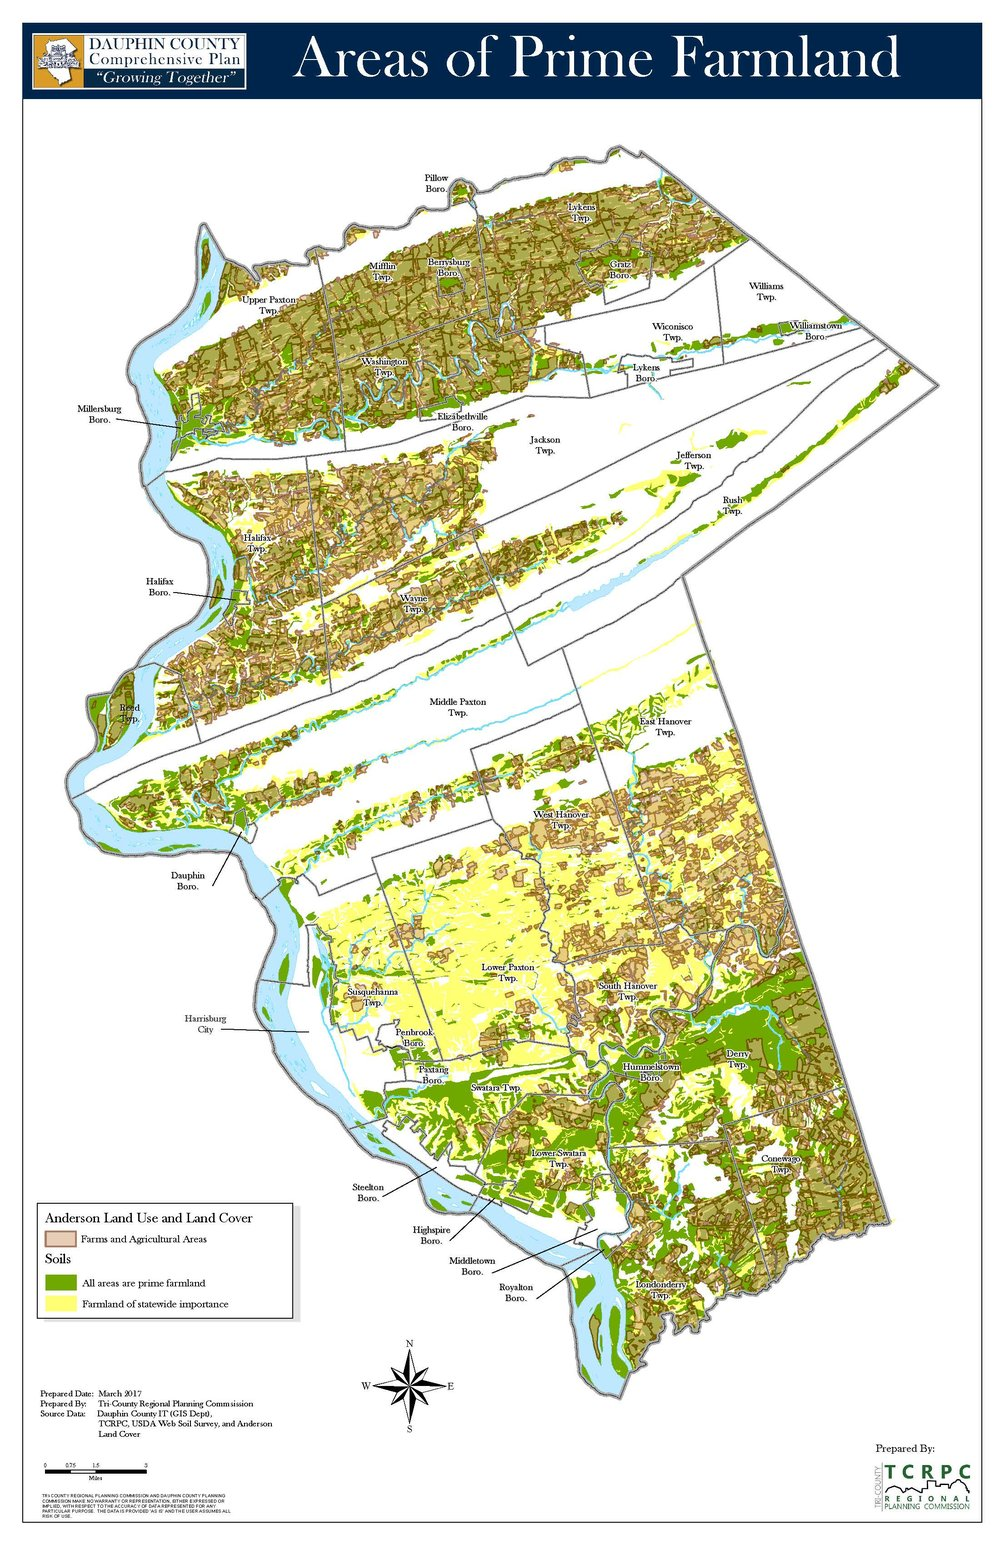 Areas of Prime Farmland Click for map (PDF)